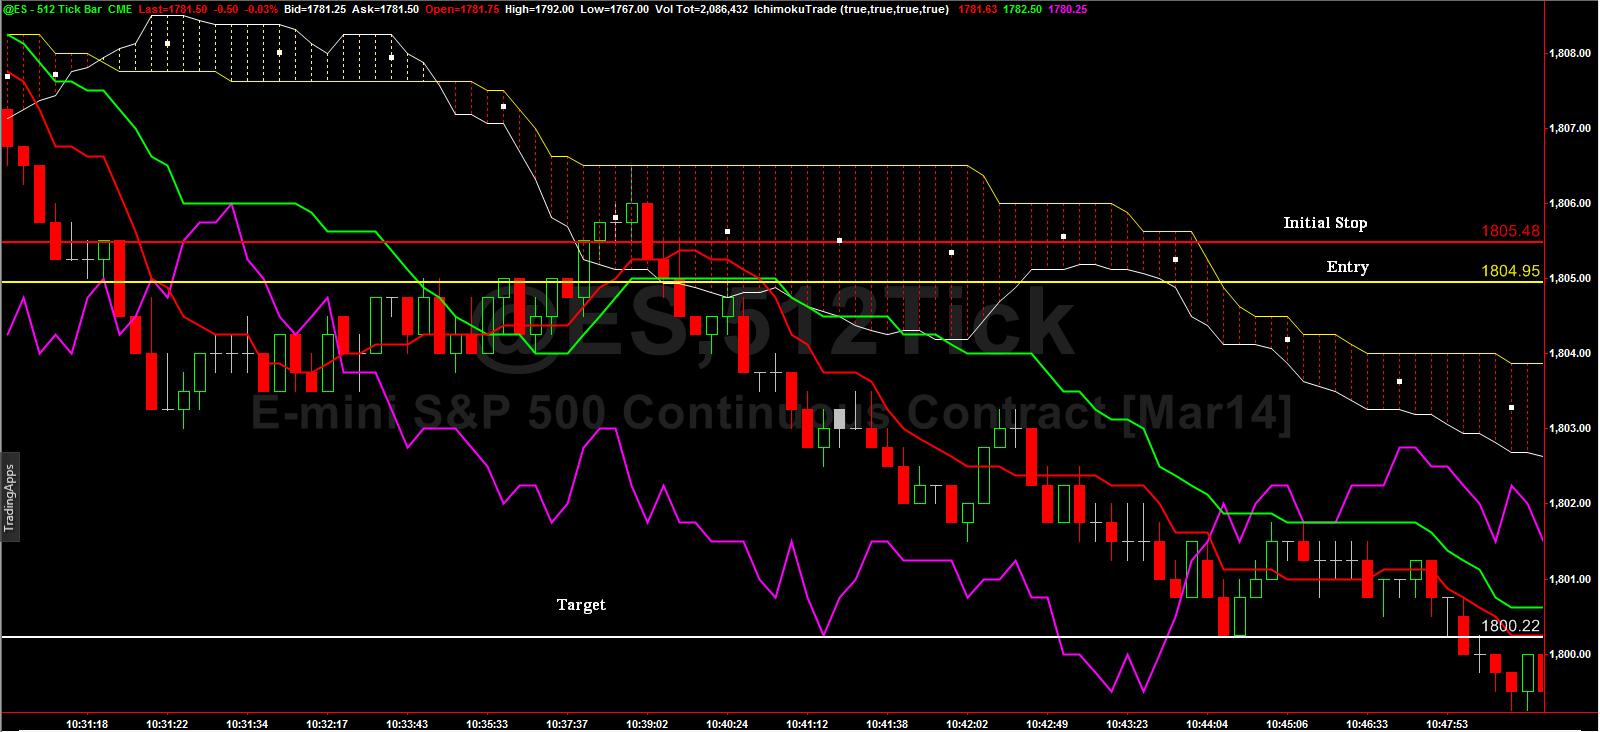 Weekly_future_jan27_2014_chart